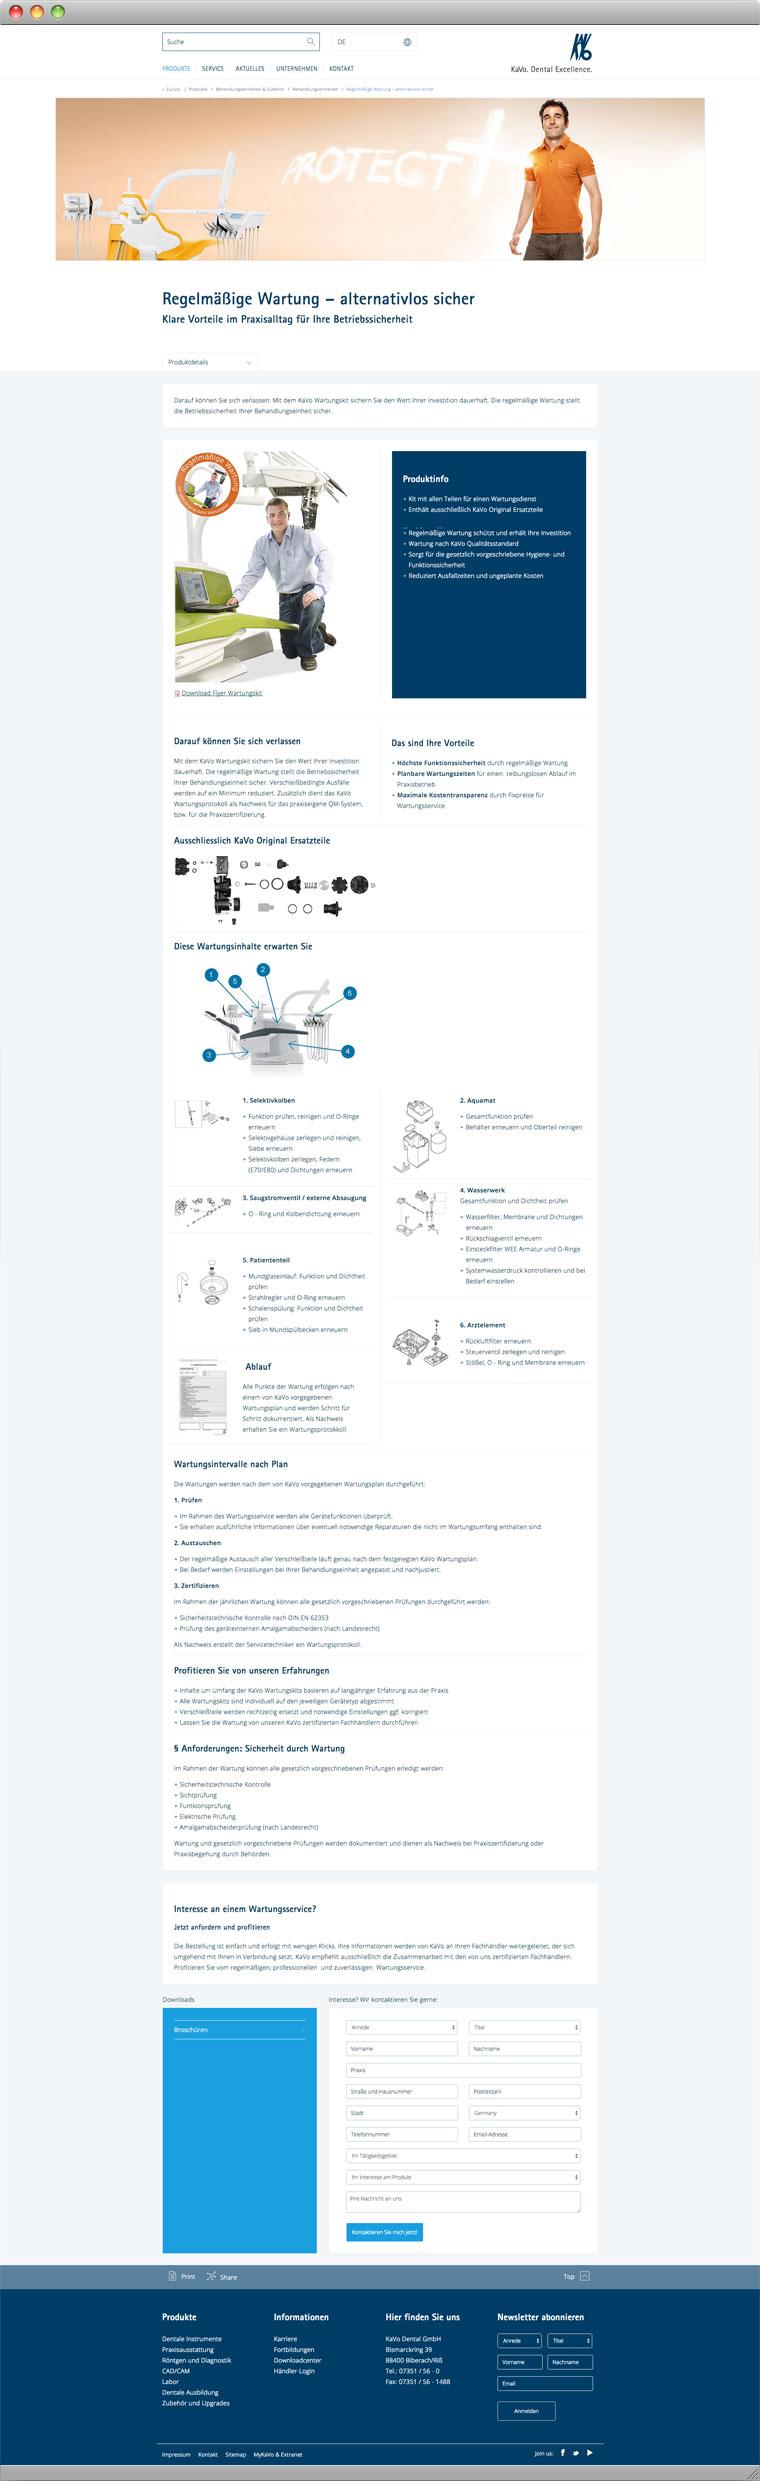 Screenshot Screenshot KaVo Dental GmbH Wartung